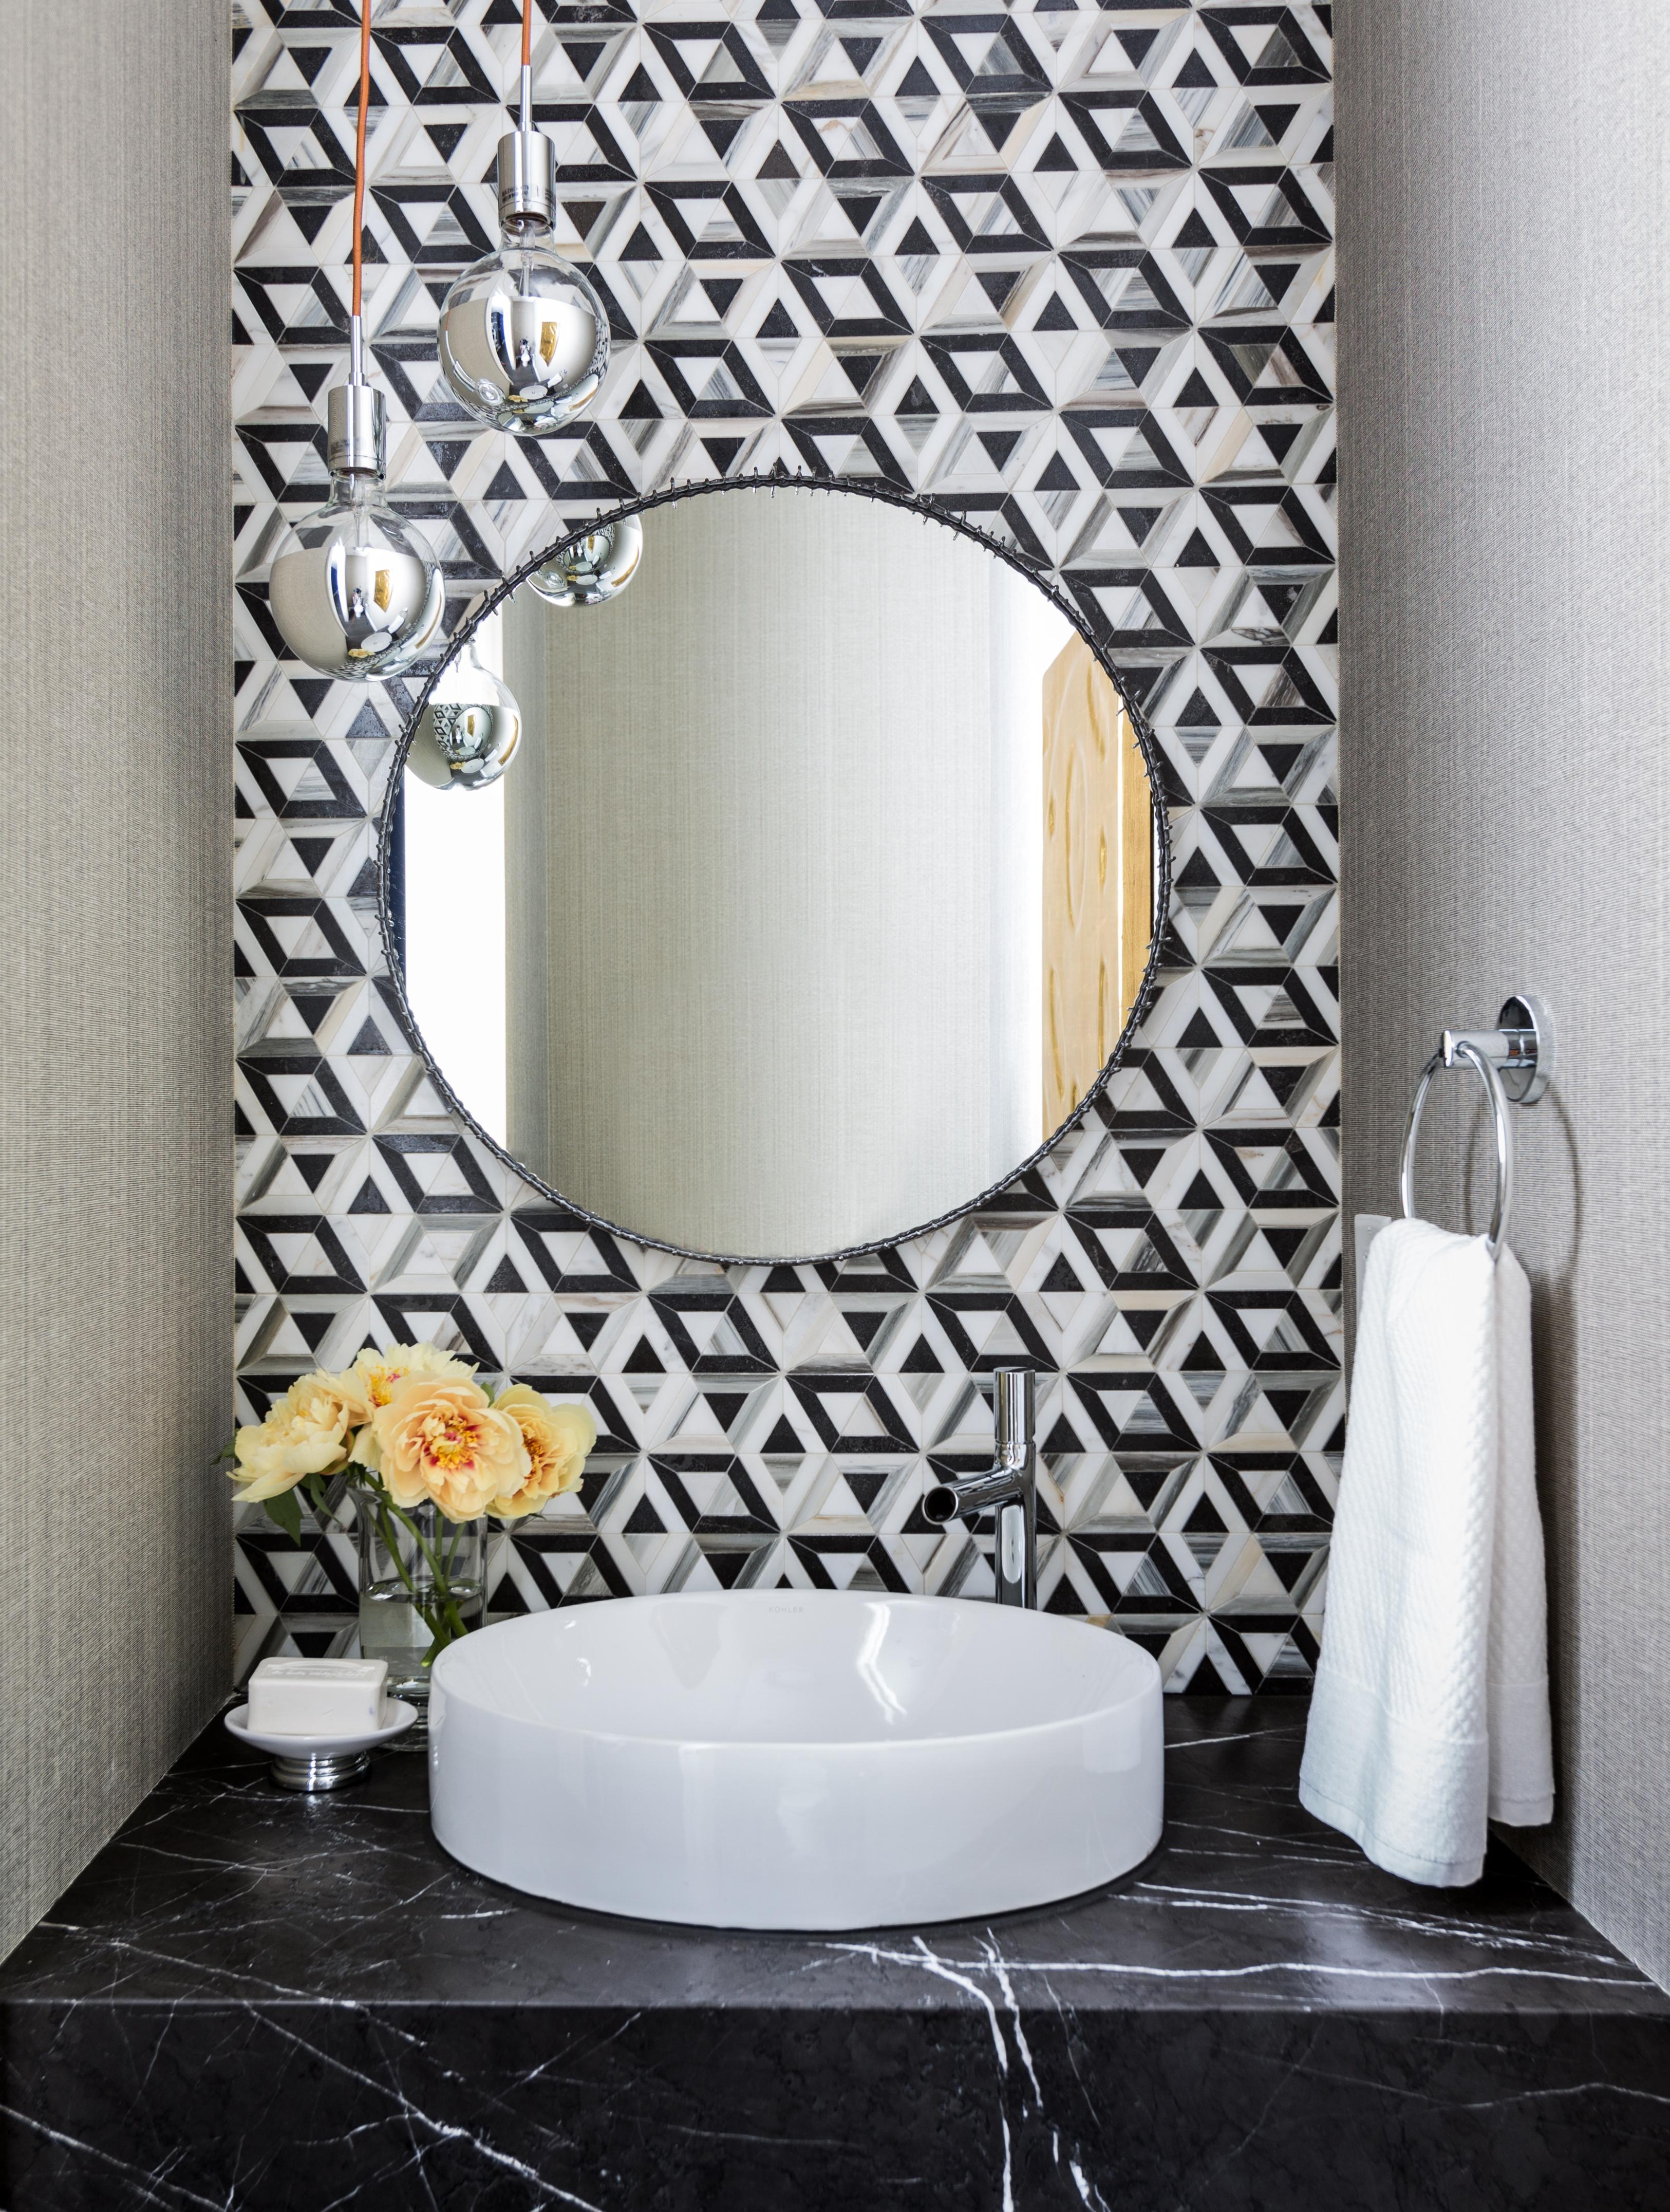 Bathroom Cabinets : Toilet Mirror Big Bathroom Mirrors Master In Custom Bathroom Vanity Mirrors (View 10 of 20)